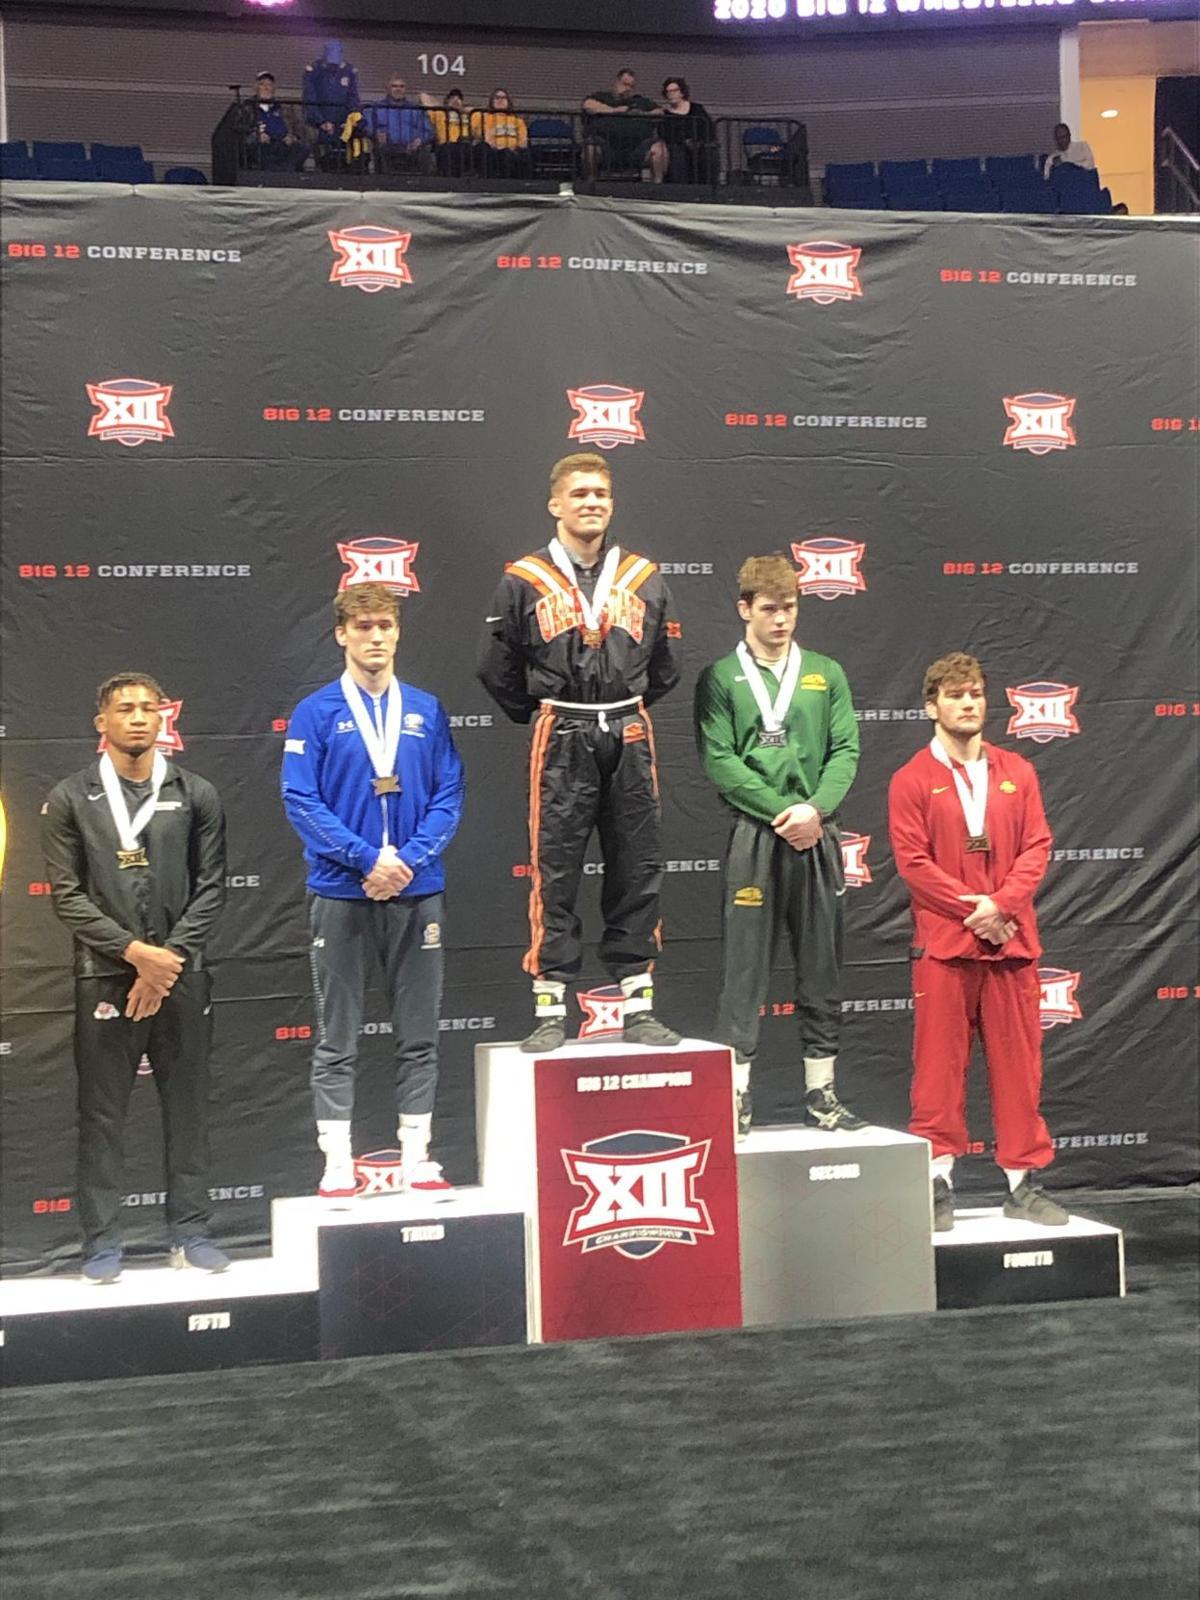 Travis Wittlake championship